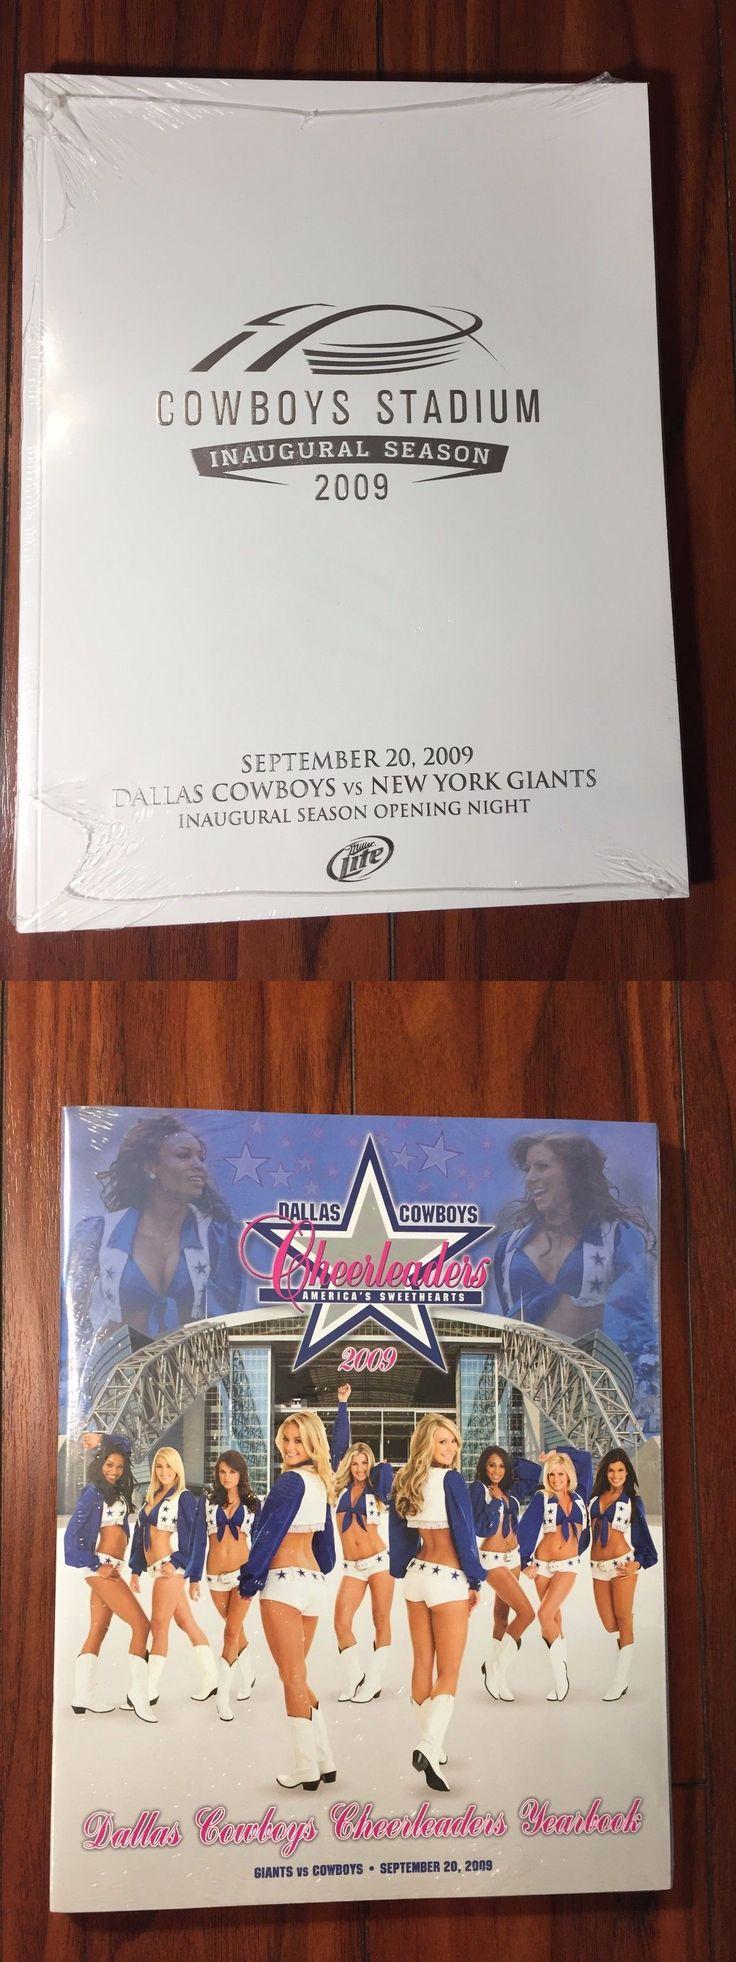 Football-Other 37753: Dallas Cowboy Stadium Inaugural Season Program 2009 -> BUY IT NOW ONLY: $30 on eBay!